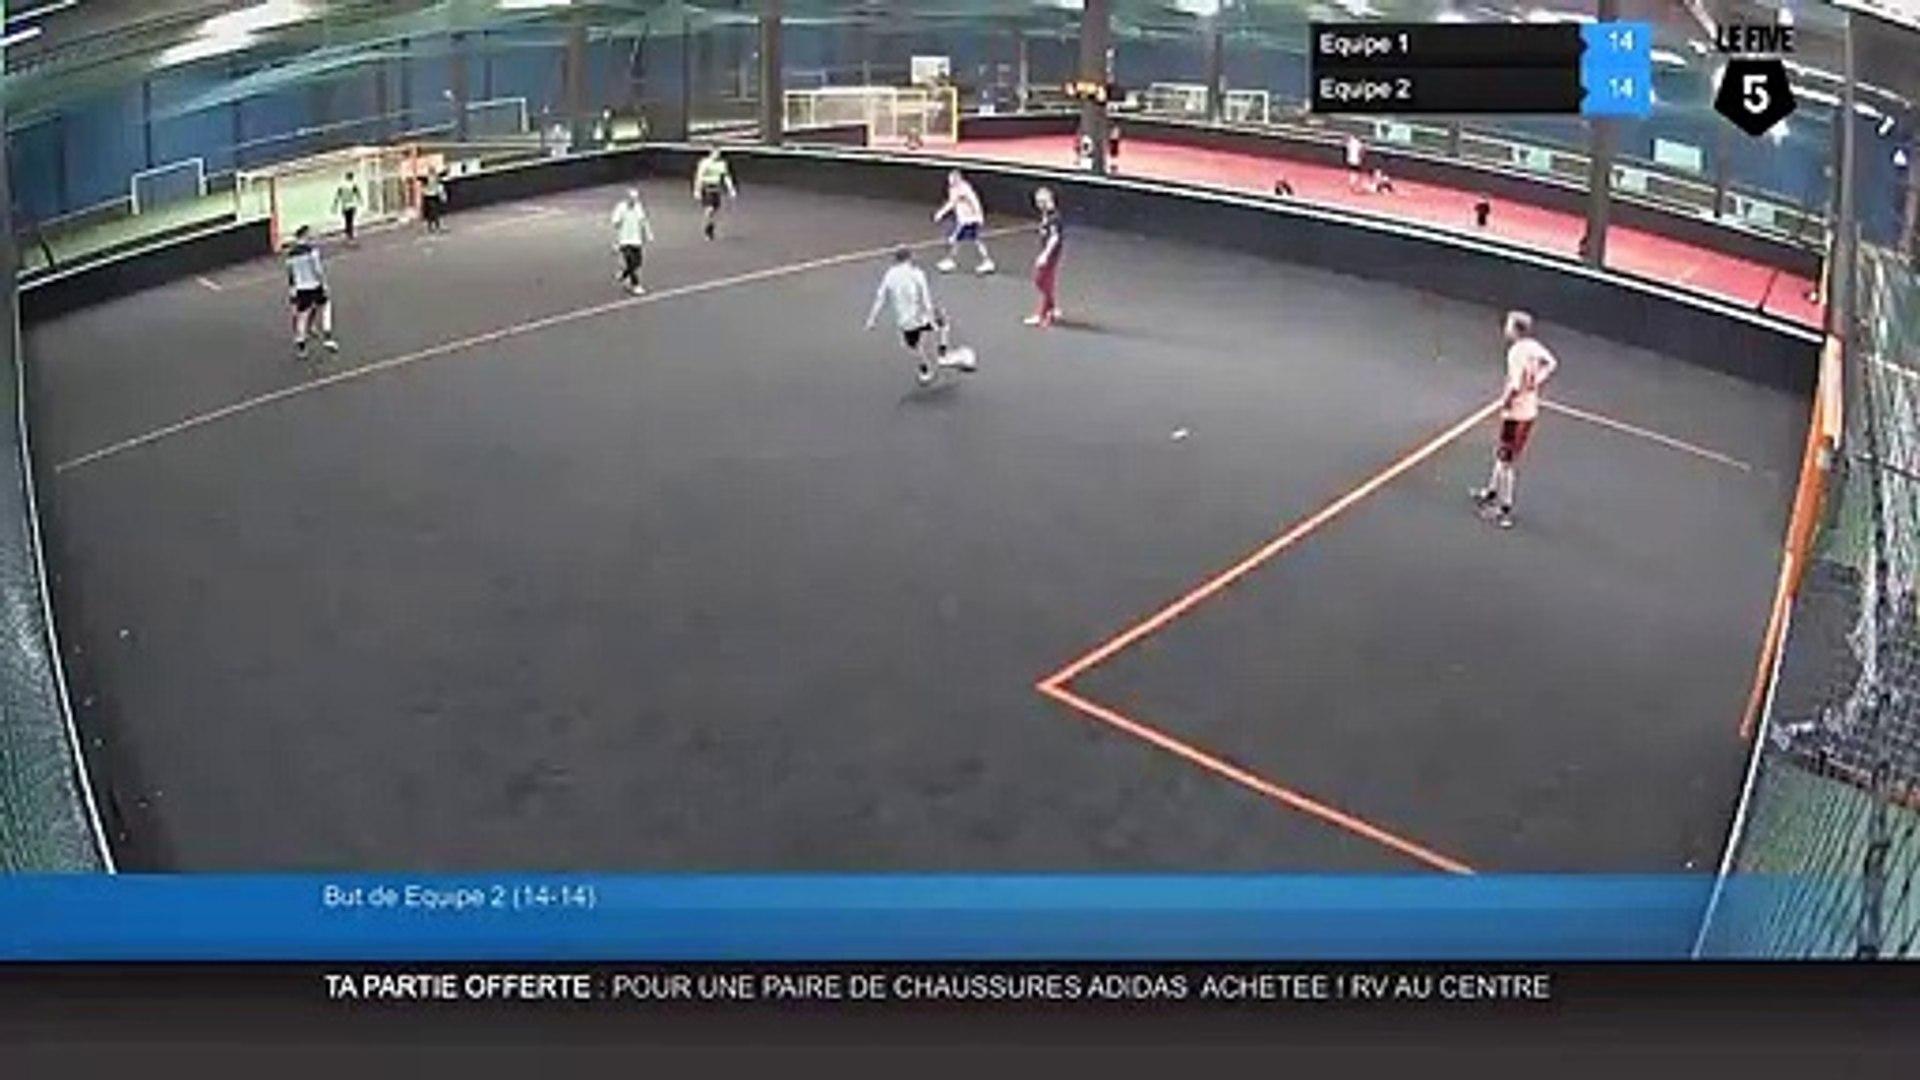 But de Equipe 2 (14-14) - Equipe 1 Vs Equipe 2 - 18/04/19 14:13 - Loisir Lens (LeFive)